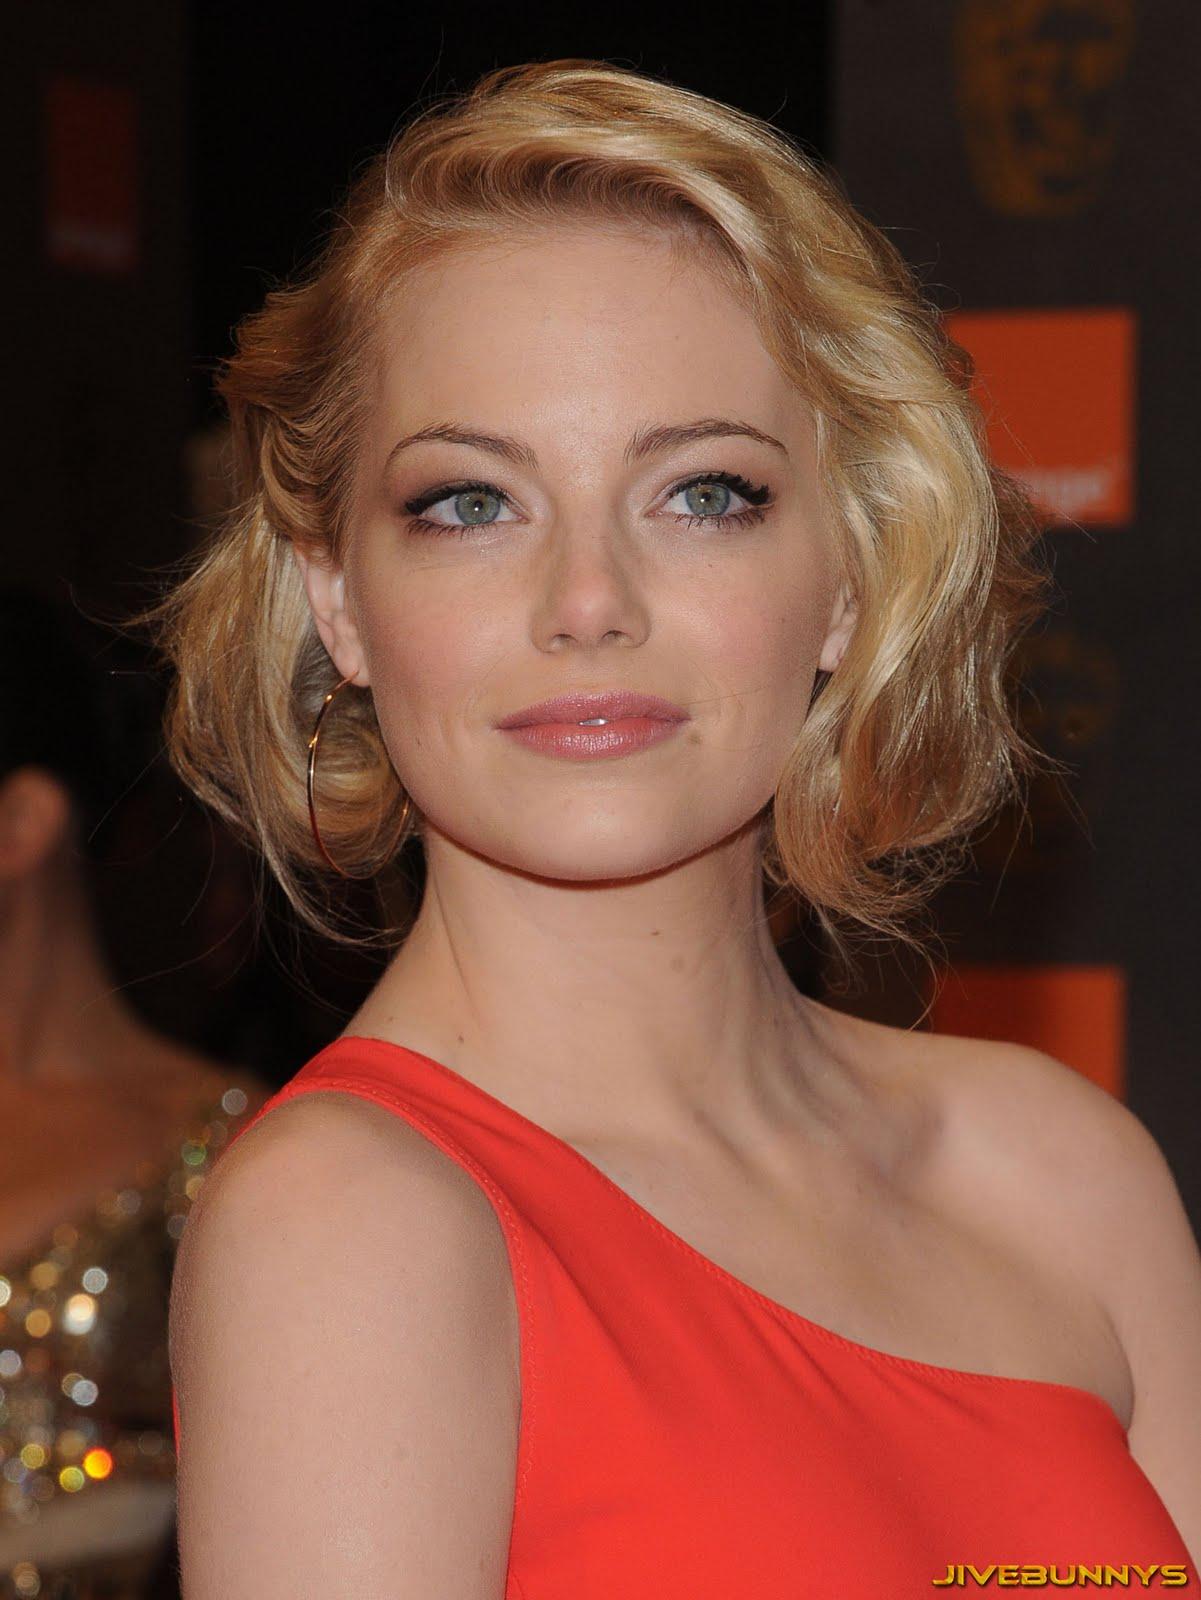 http://1.bp.blogspot.com/-UIYCSDzM51Q/Tc3yvMXFV8I/AAAAAAACBTU/0cIWWIRYnHo/s1600/sexy-emma-stone-celebrity-43046.jpg